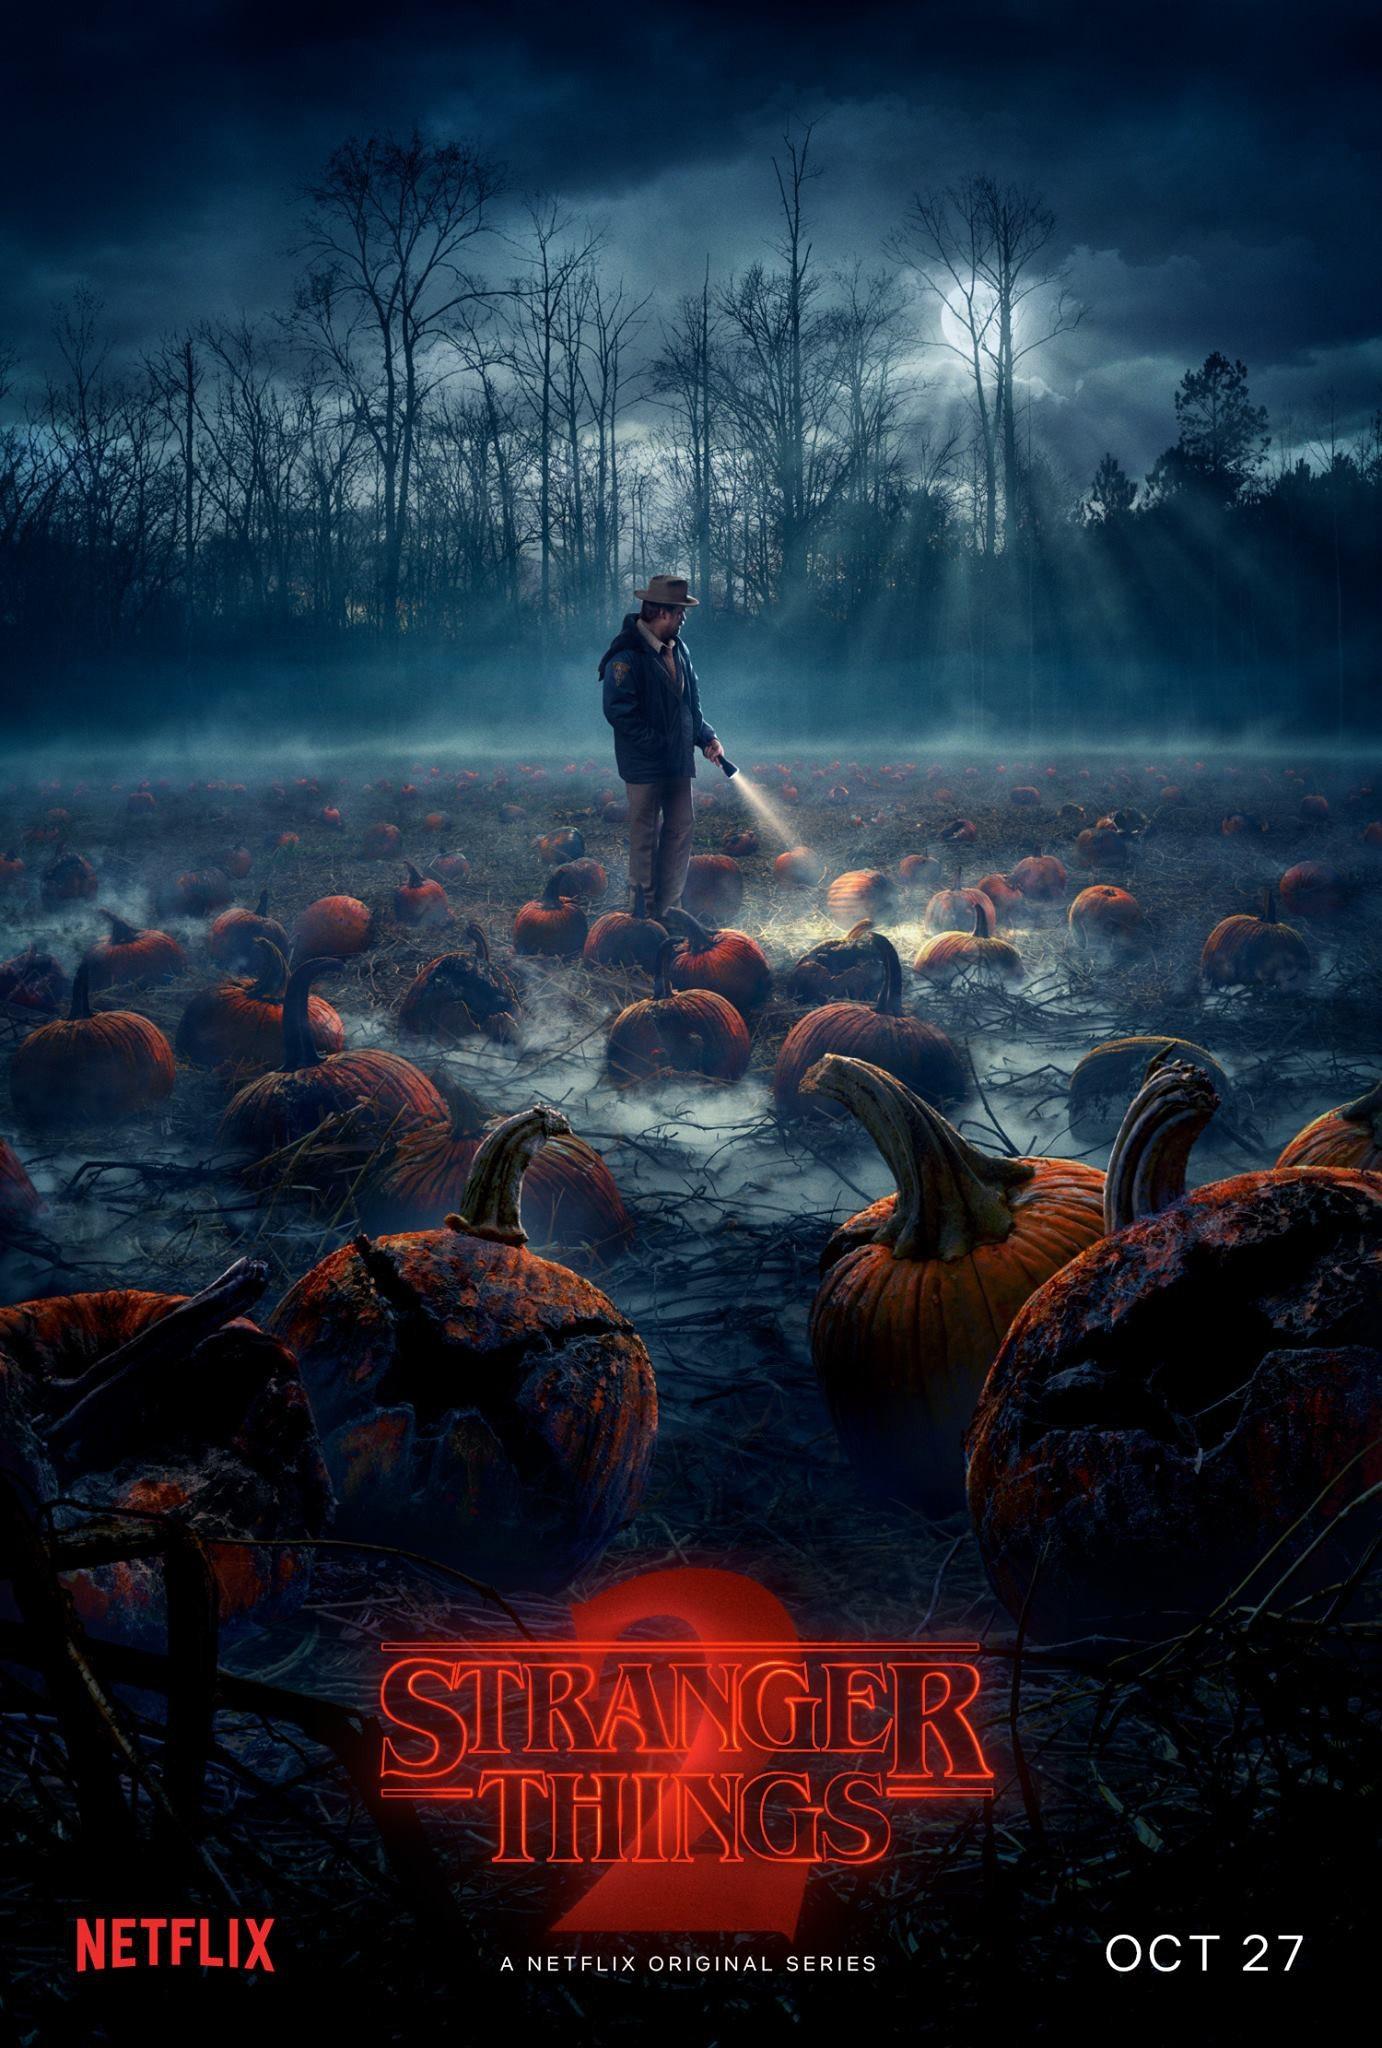 Stranger Things 2 pumpkins poster